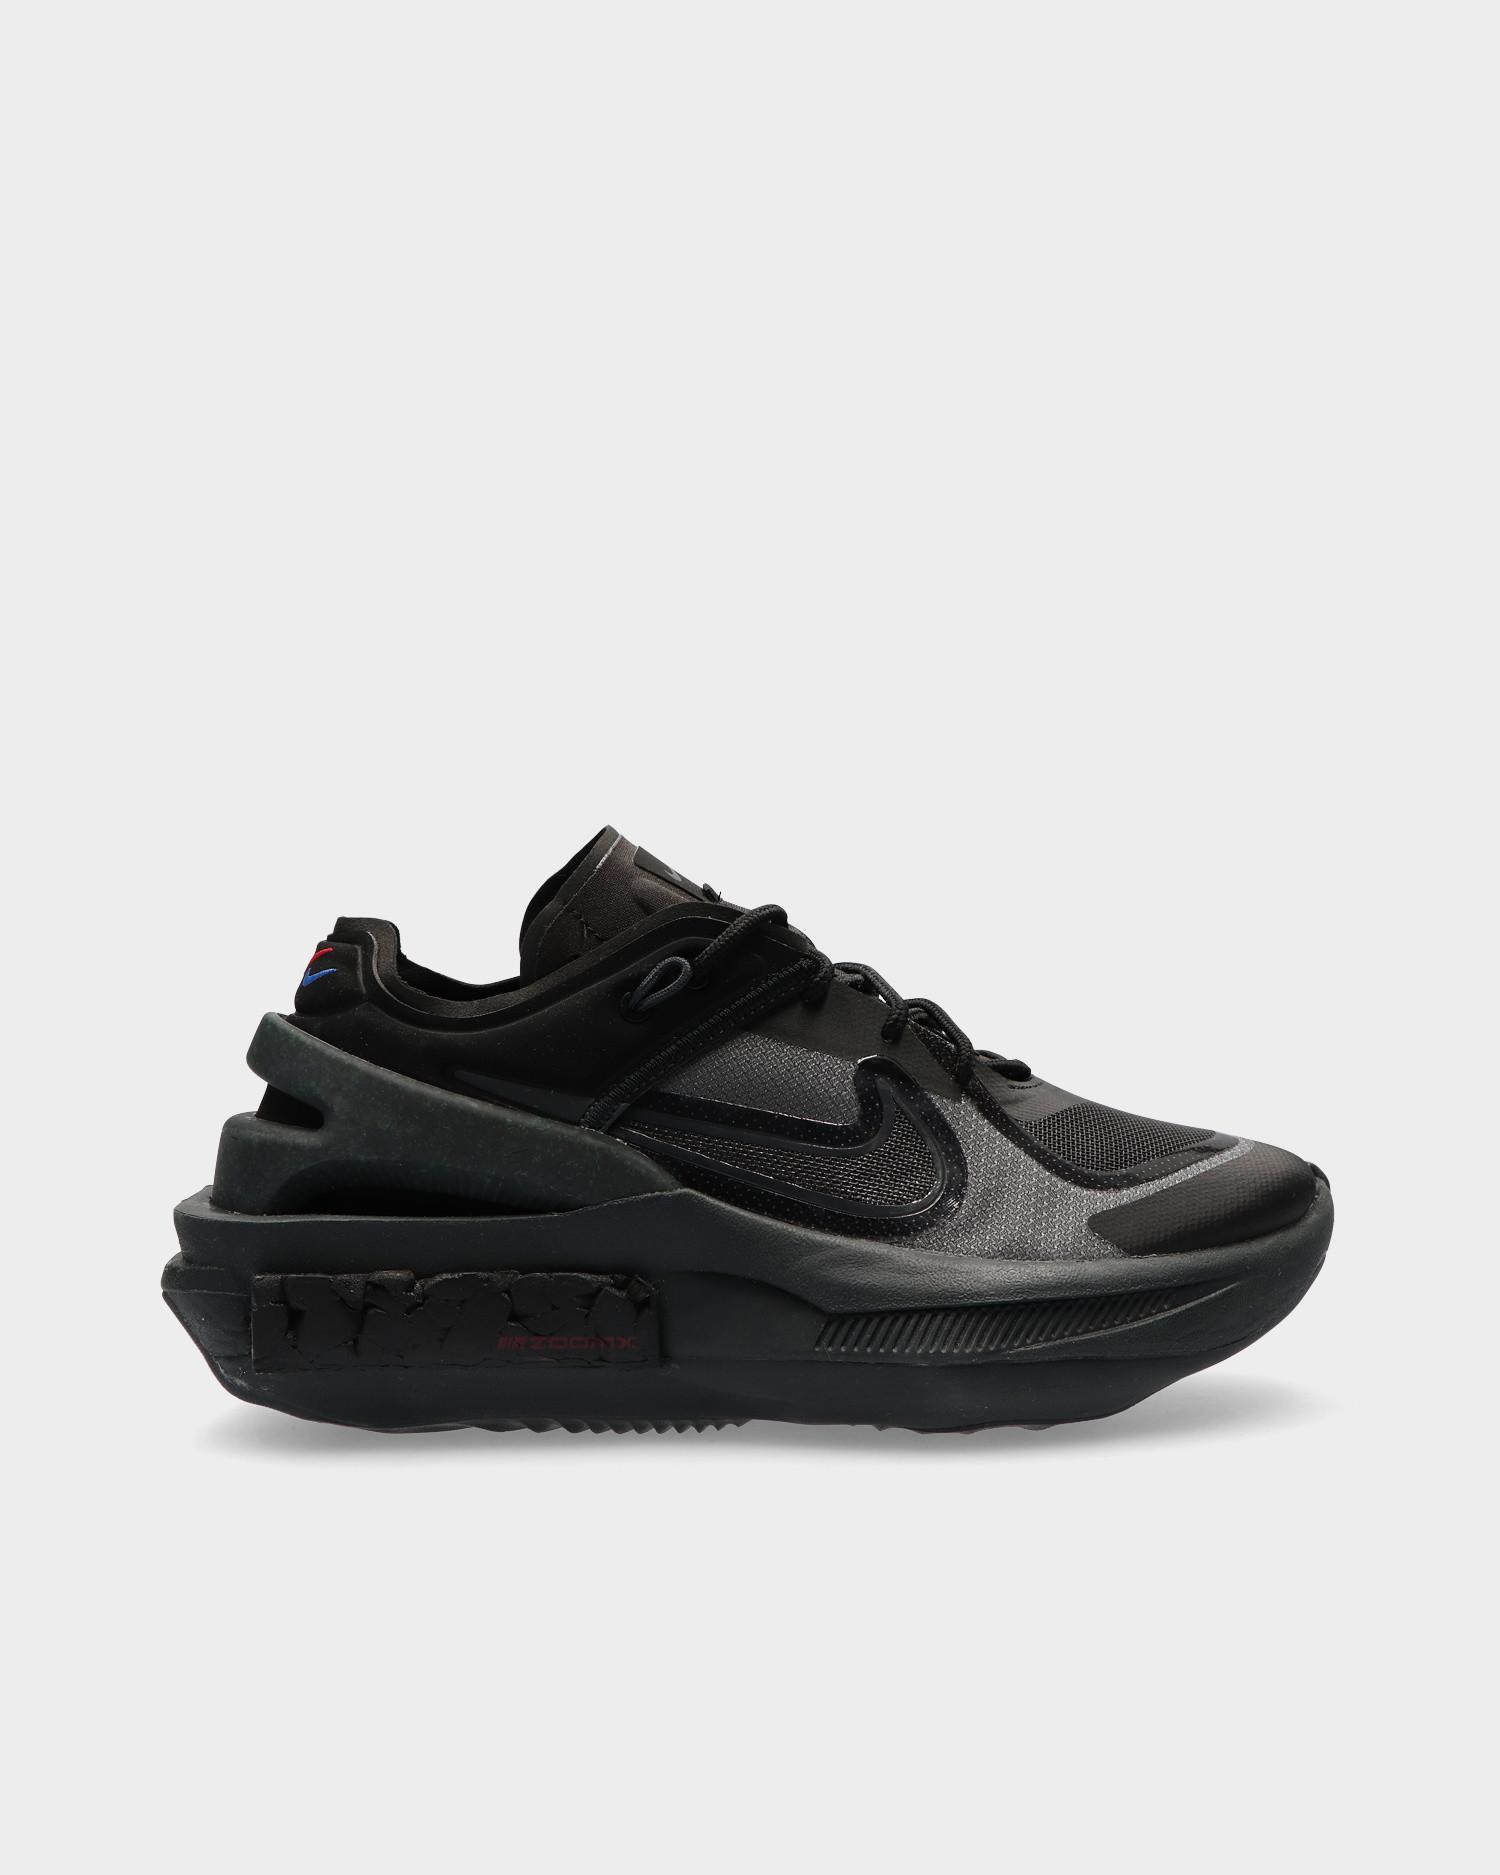 Nike Wmns Fontanka Edge Black/black-off noir-university red